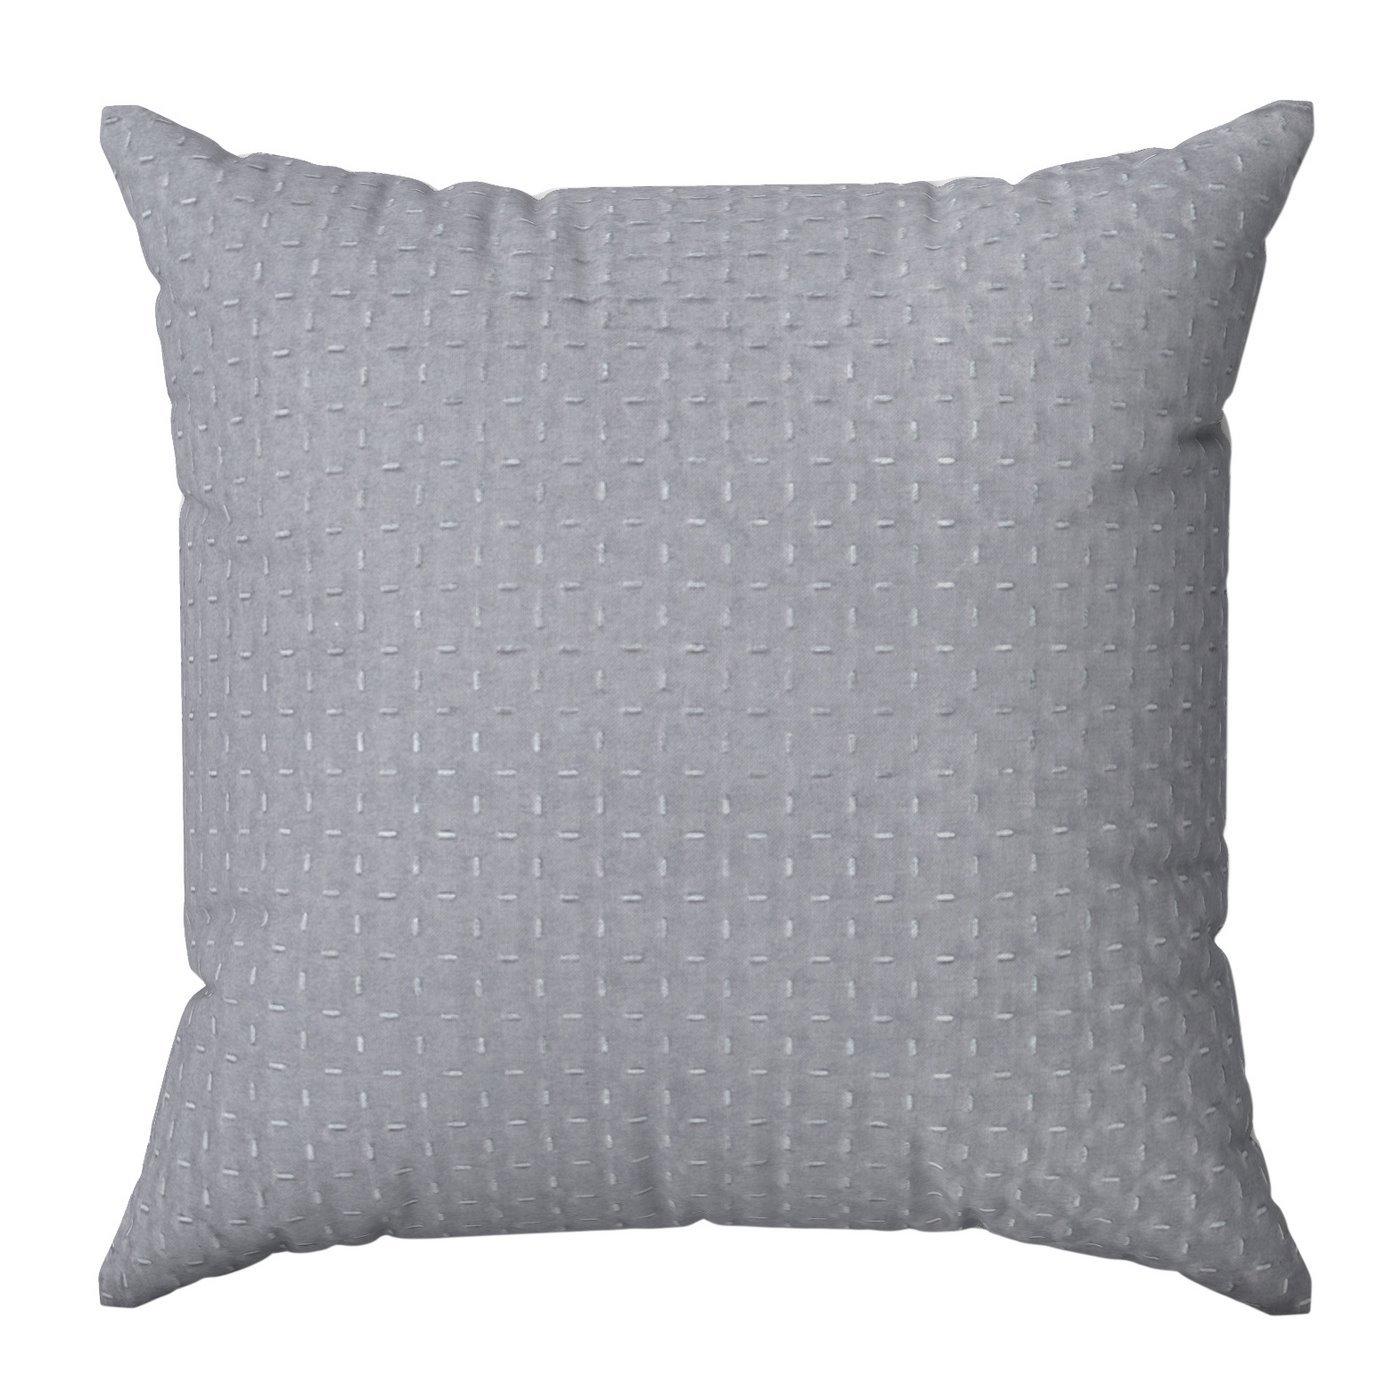 Poszewka na poduszkę pikowana hot press 40 x 40 cm srebrno-różowa